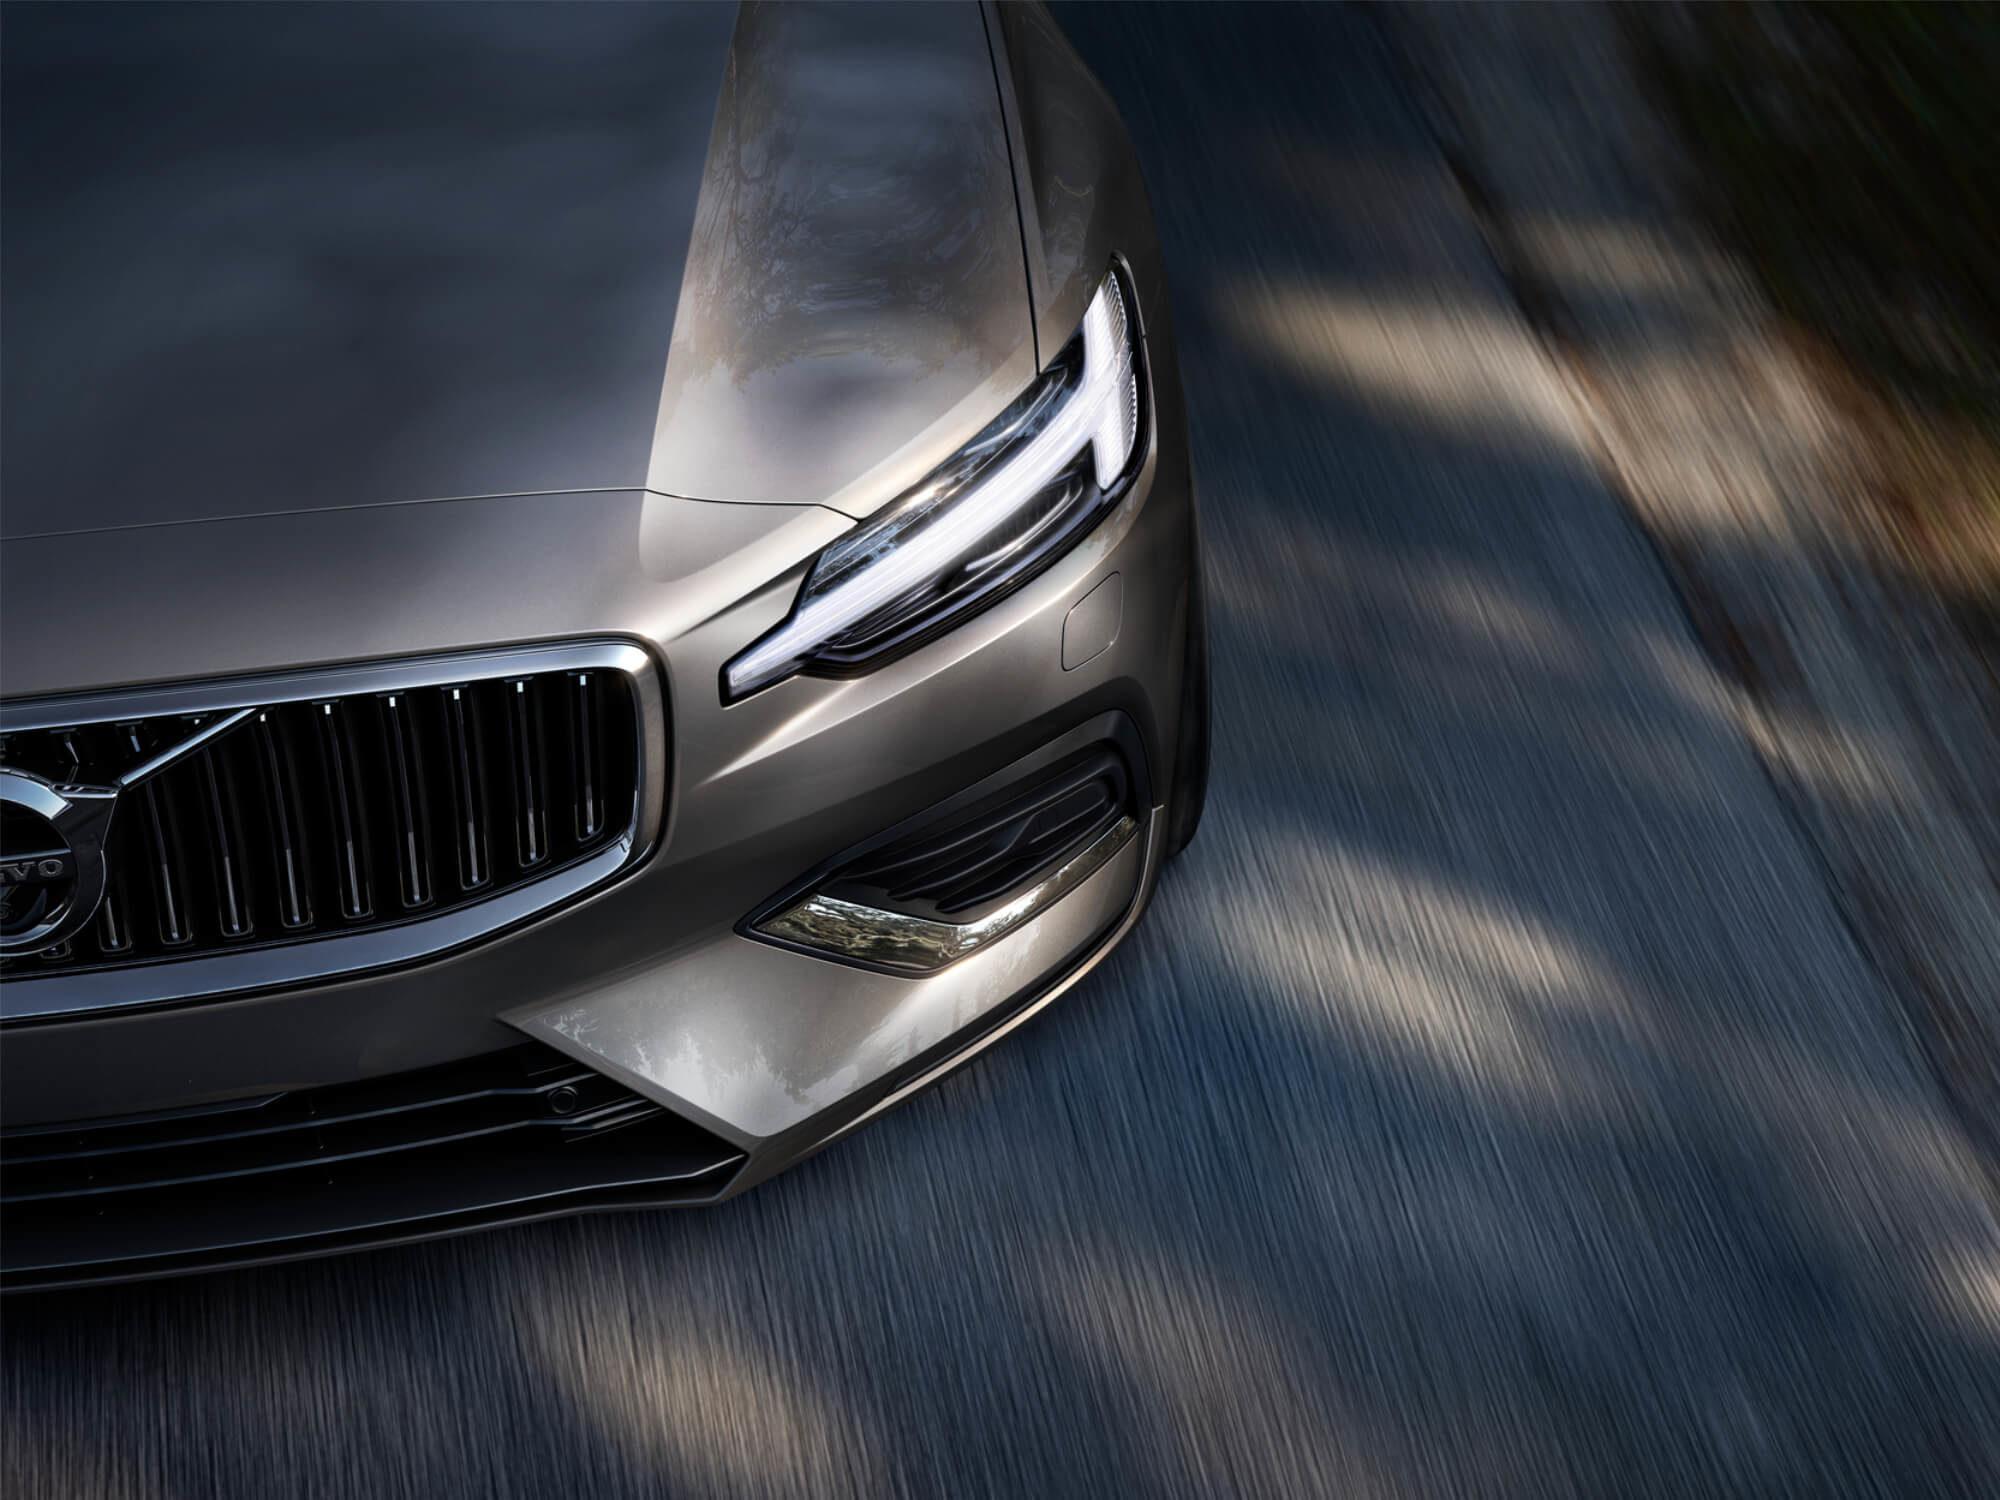 Volvo S60 Mild Hybrid voorkant detail